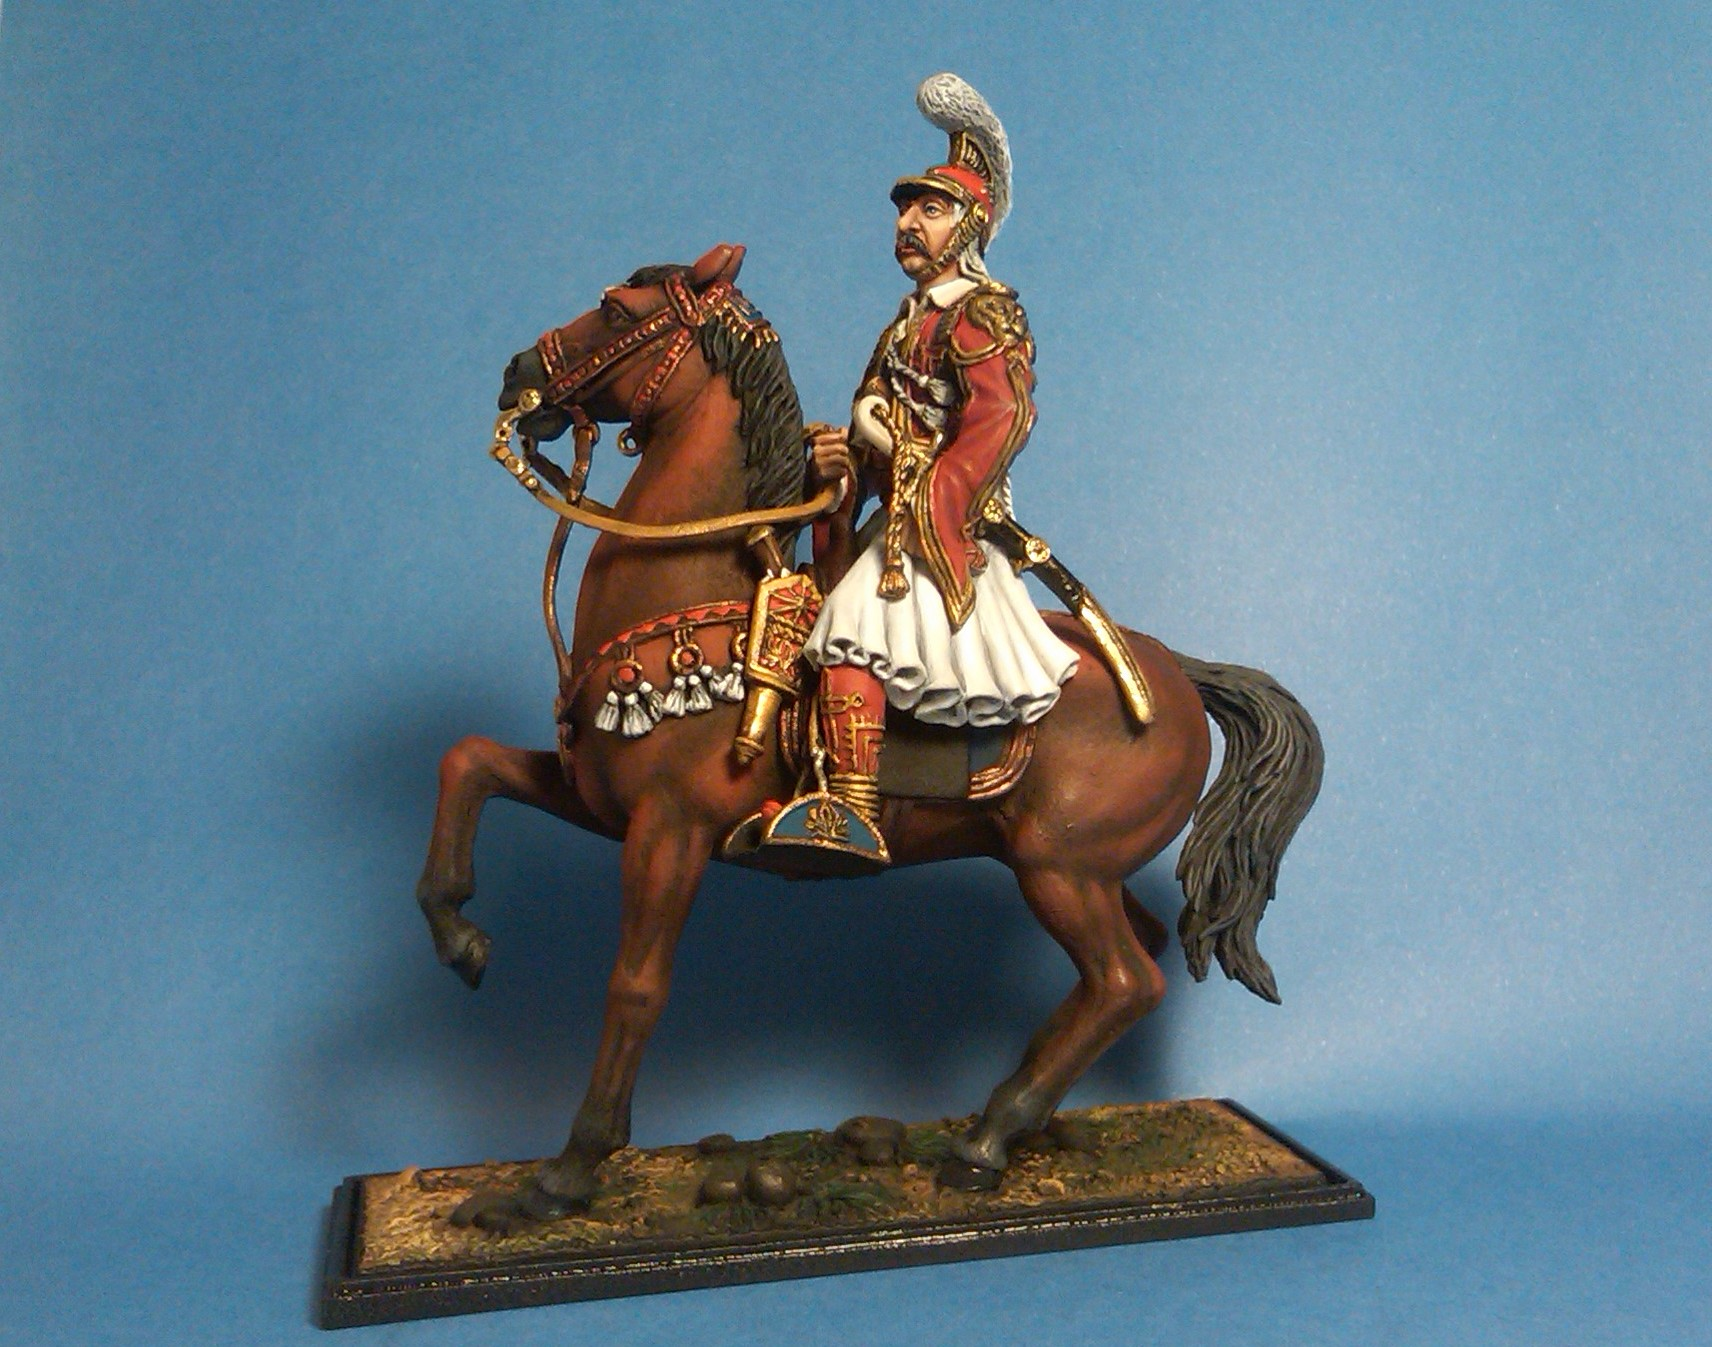 www.greekheroes.gr/miniatures-figures/54mm/Greek-revolution-1821-theodoros-kolokotronis/